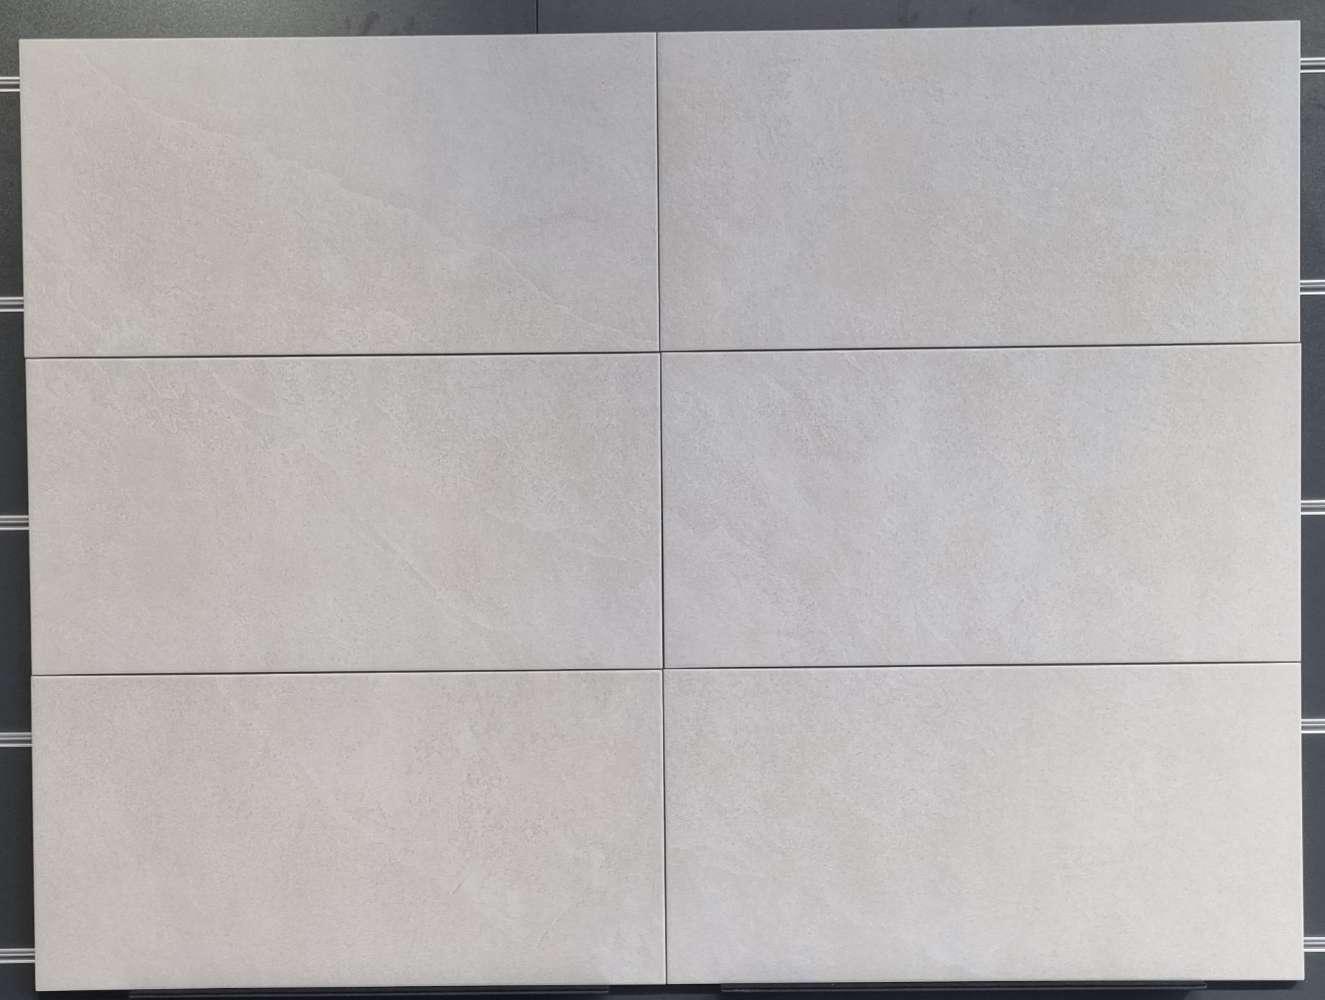 Bodenfliese, Ilbes, sand, 30x60cm